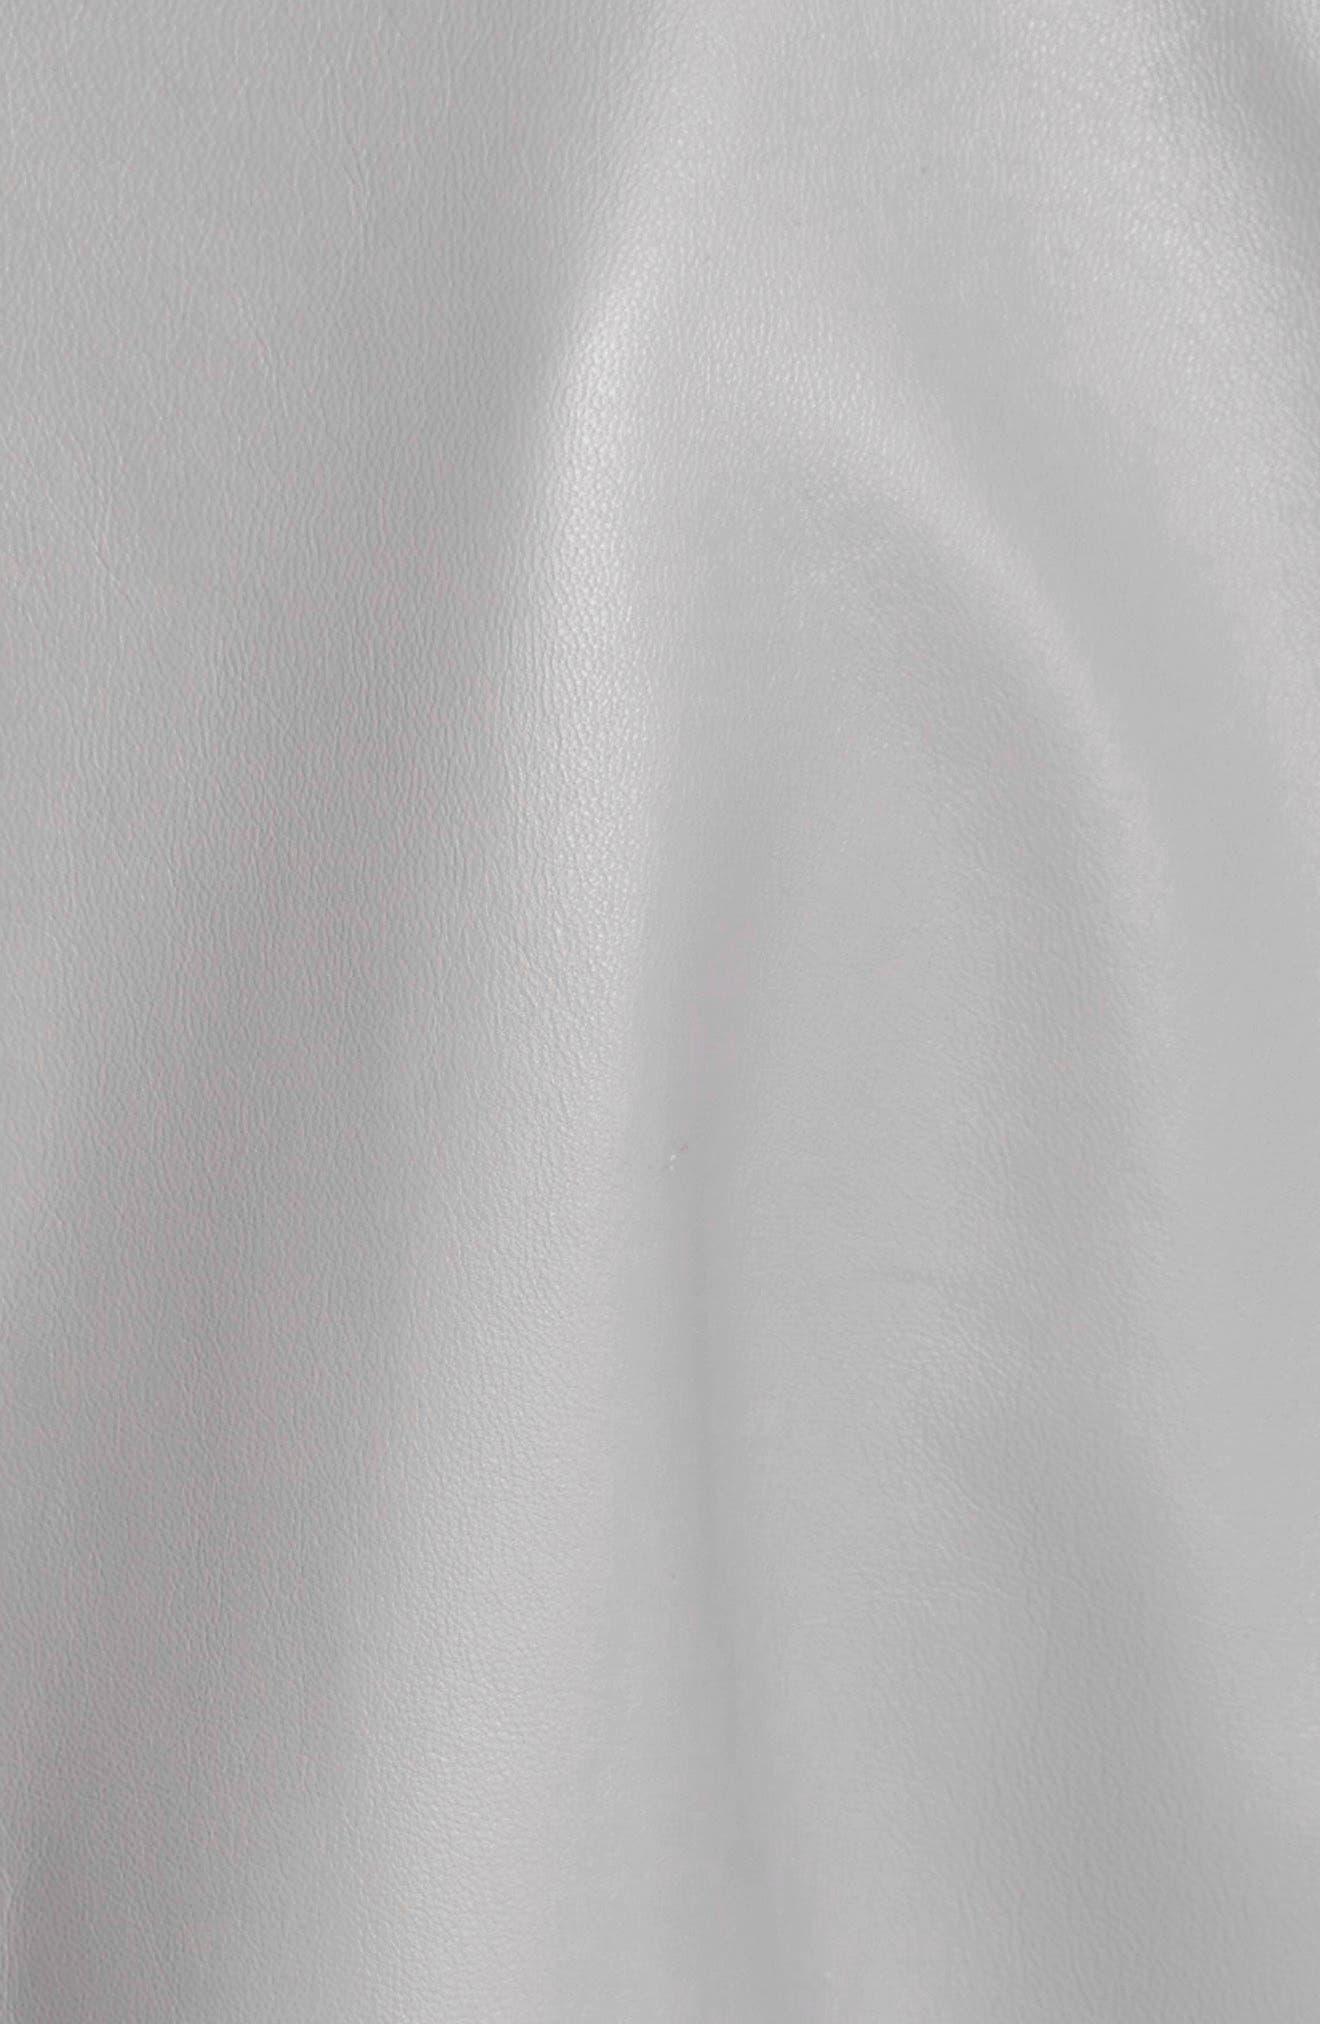 Studded Nappa Leather Jacket,                             Alternate thumbnail 6, color,                             020